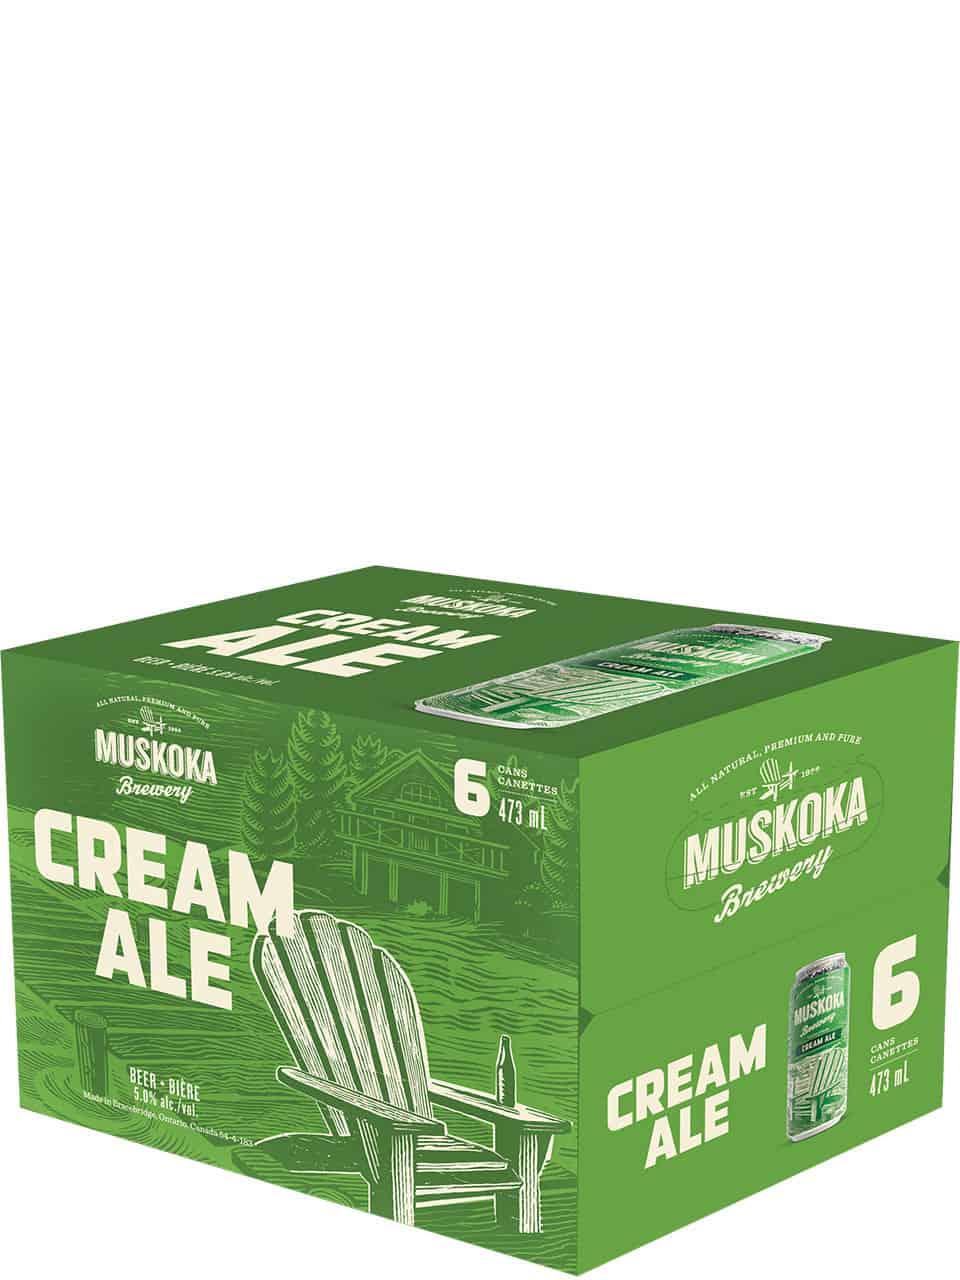 Muskoka Cream Ale 6 Pack Cans